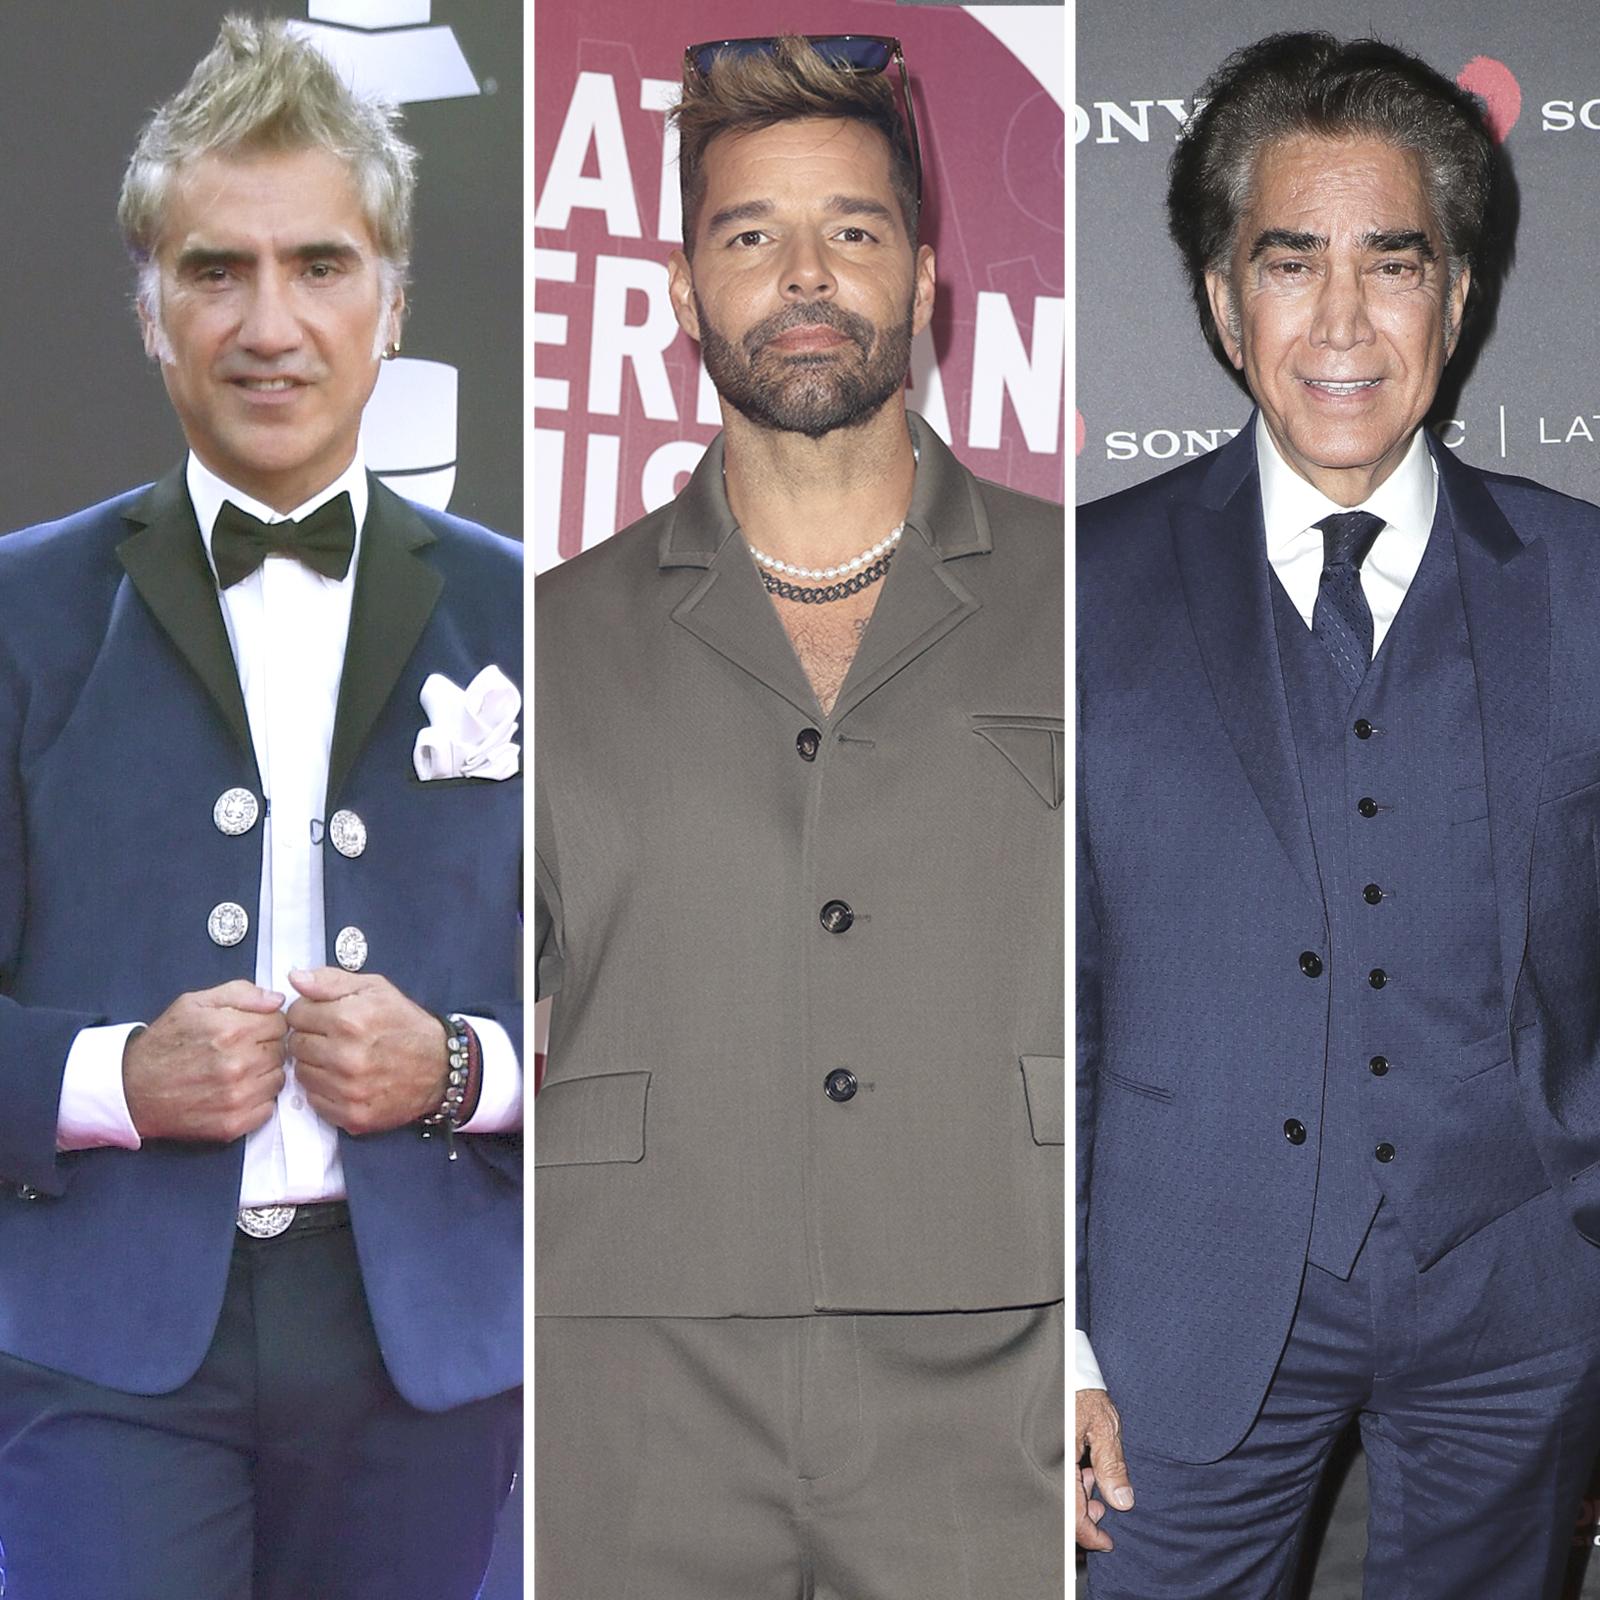 Alejandro Fernandez, Ricky Martin y Jose Luis Rodriguez